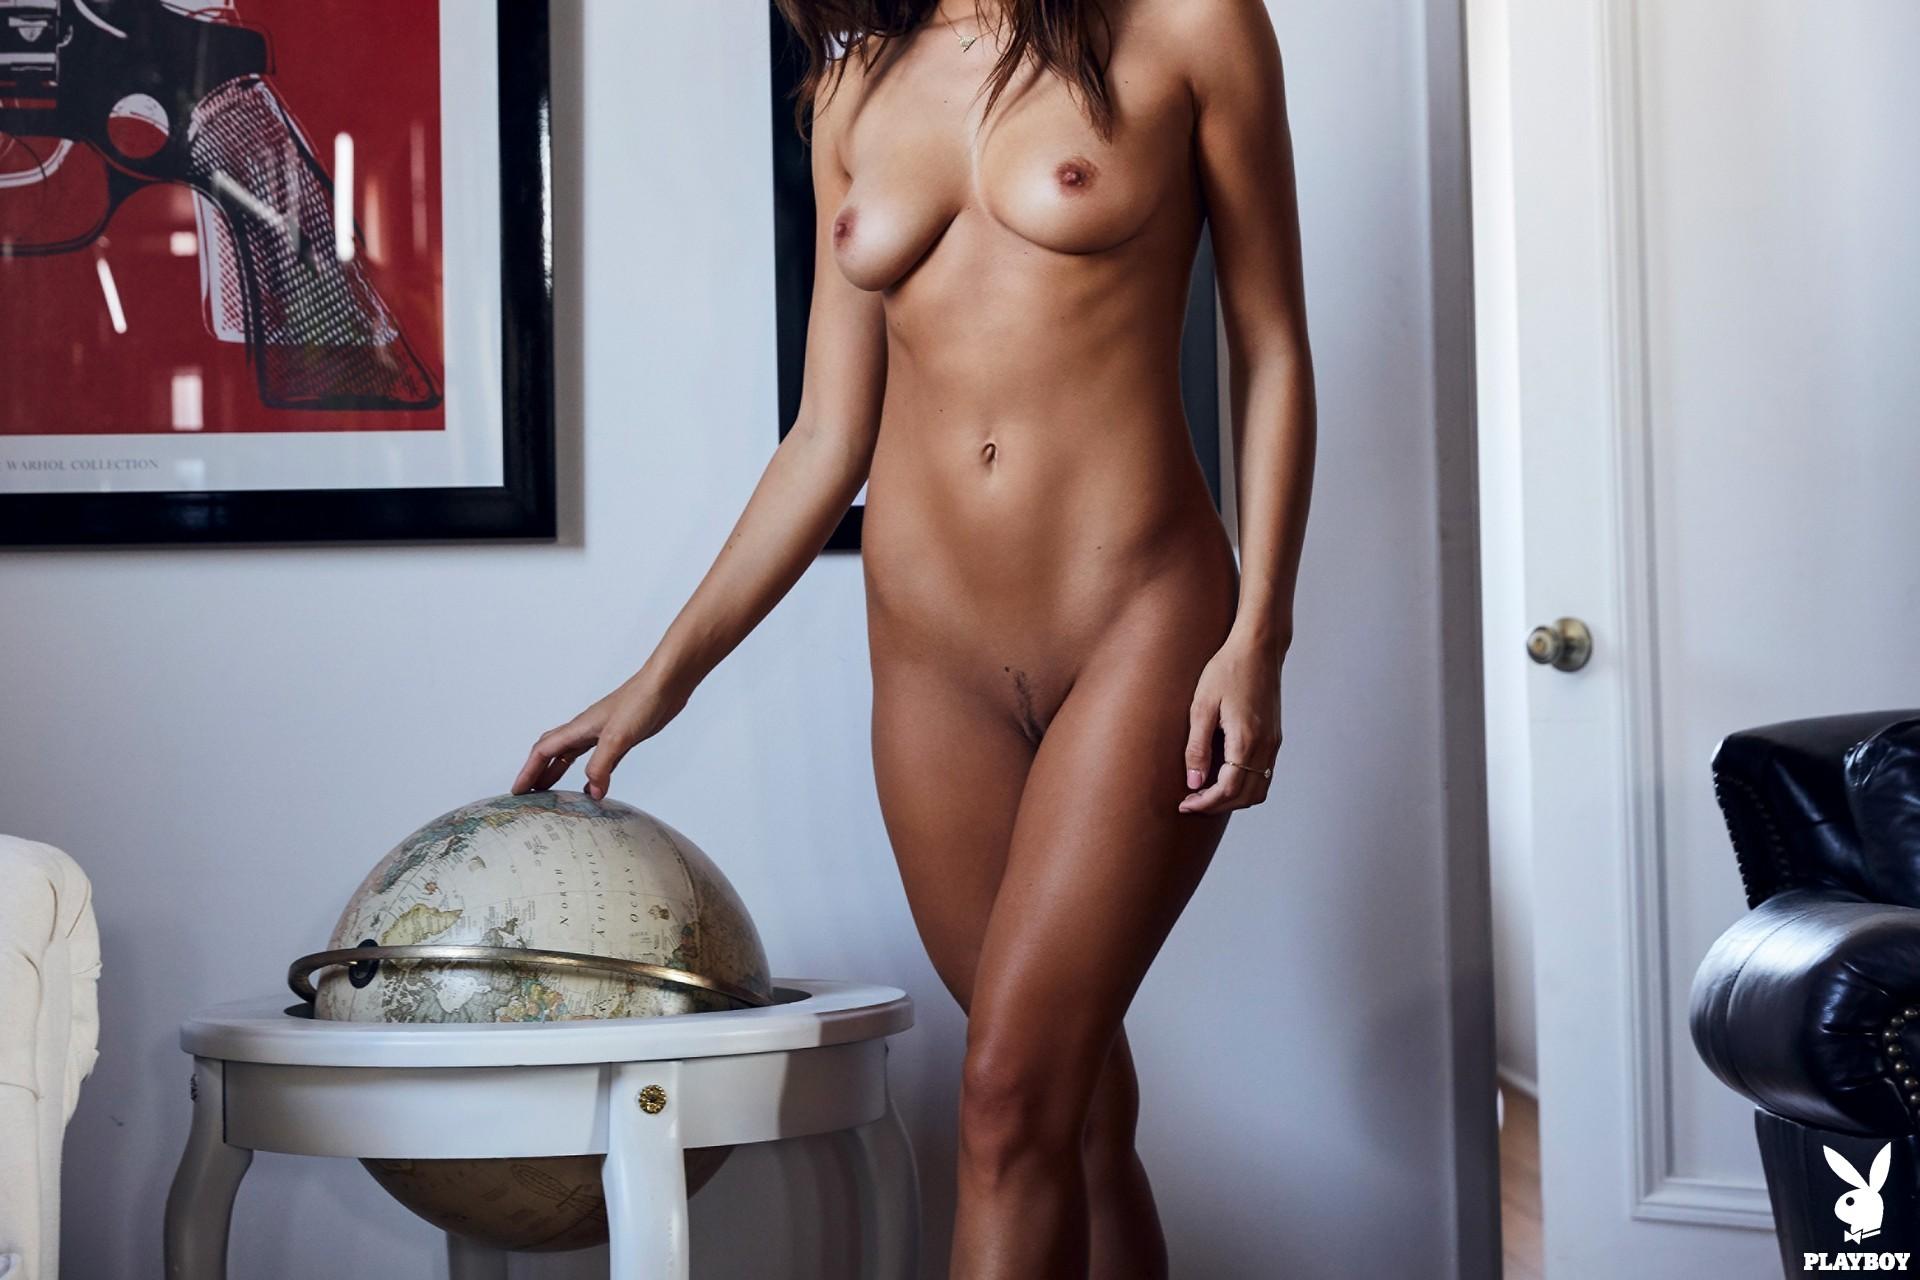 Sydney Ladd In Finer Things (32)